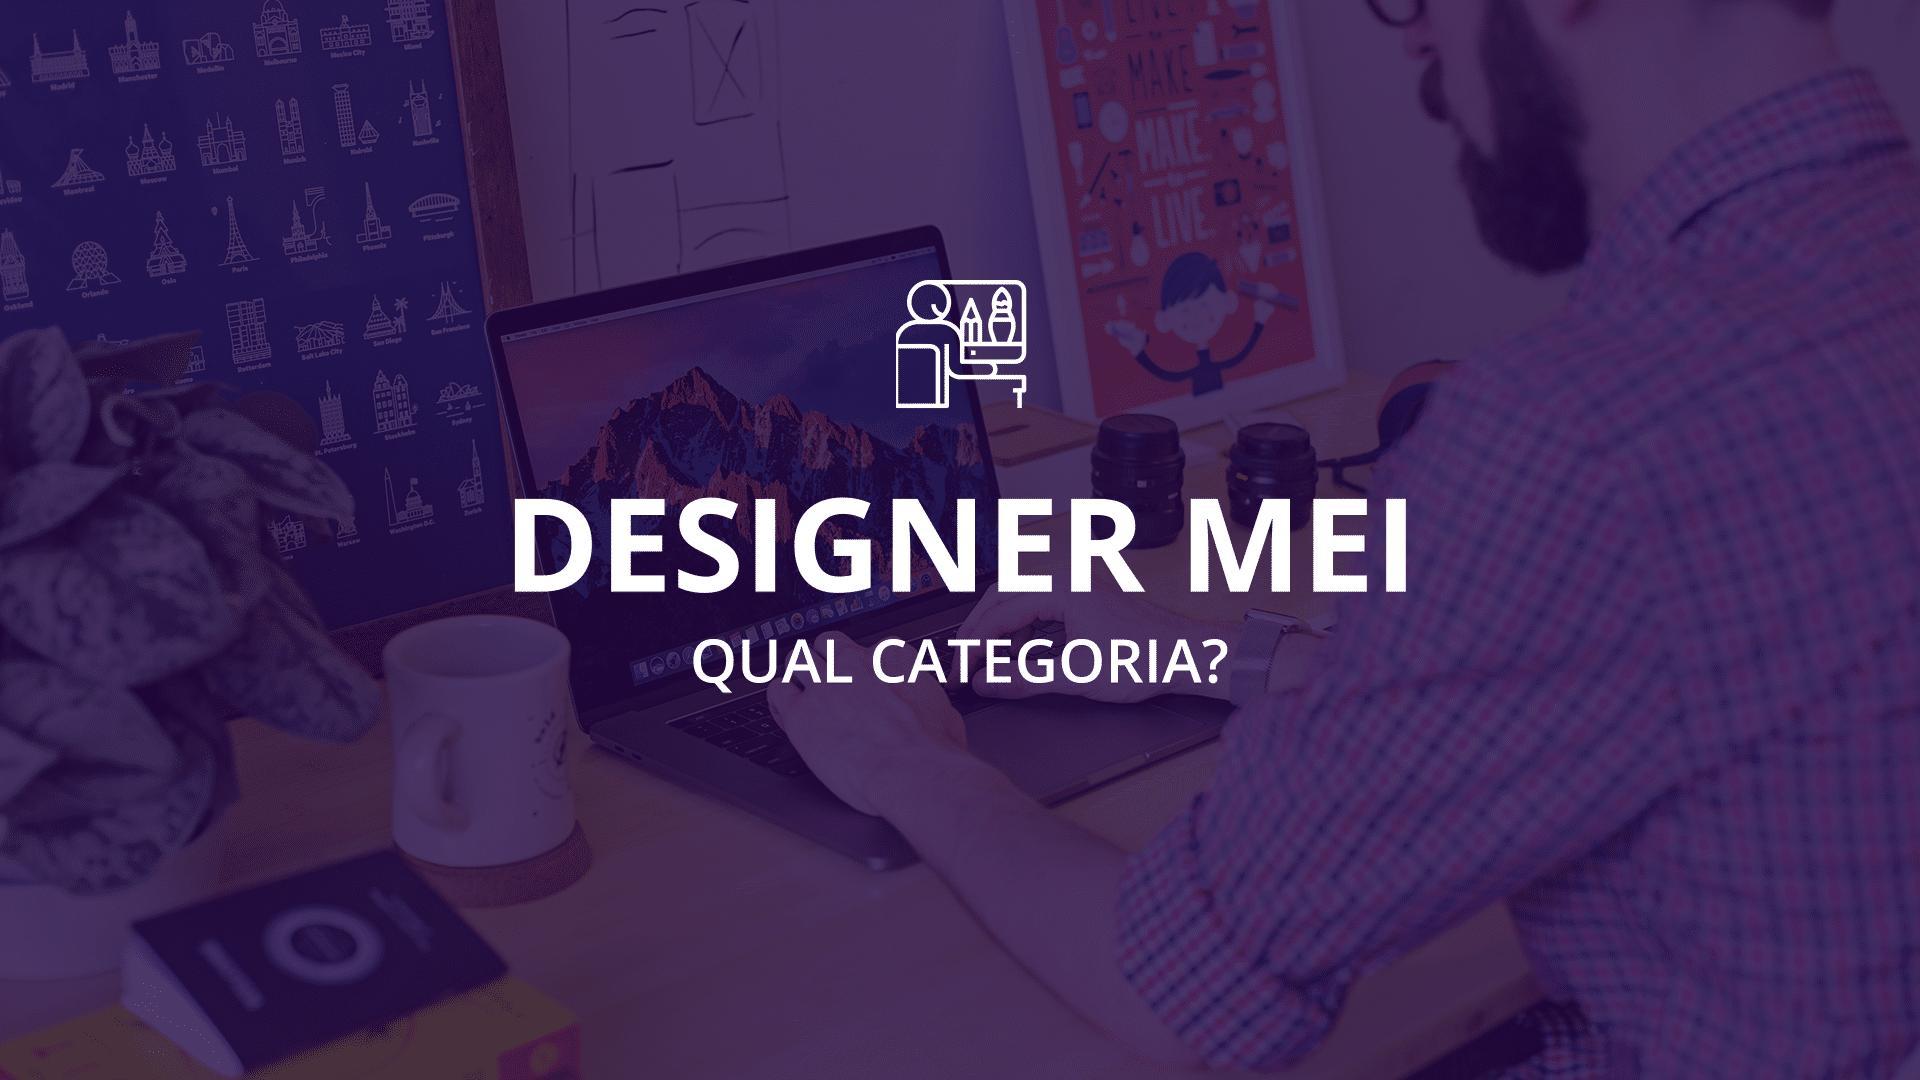 designer mei qual categoria escolher designe